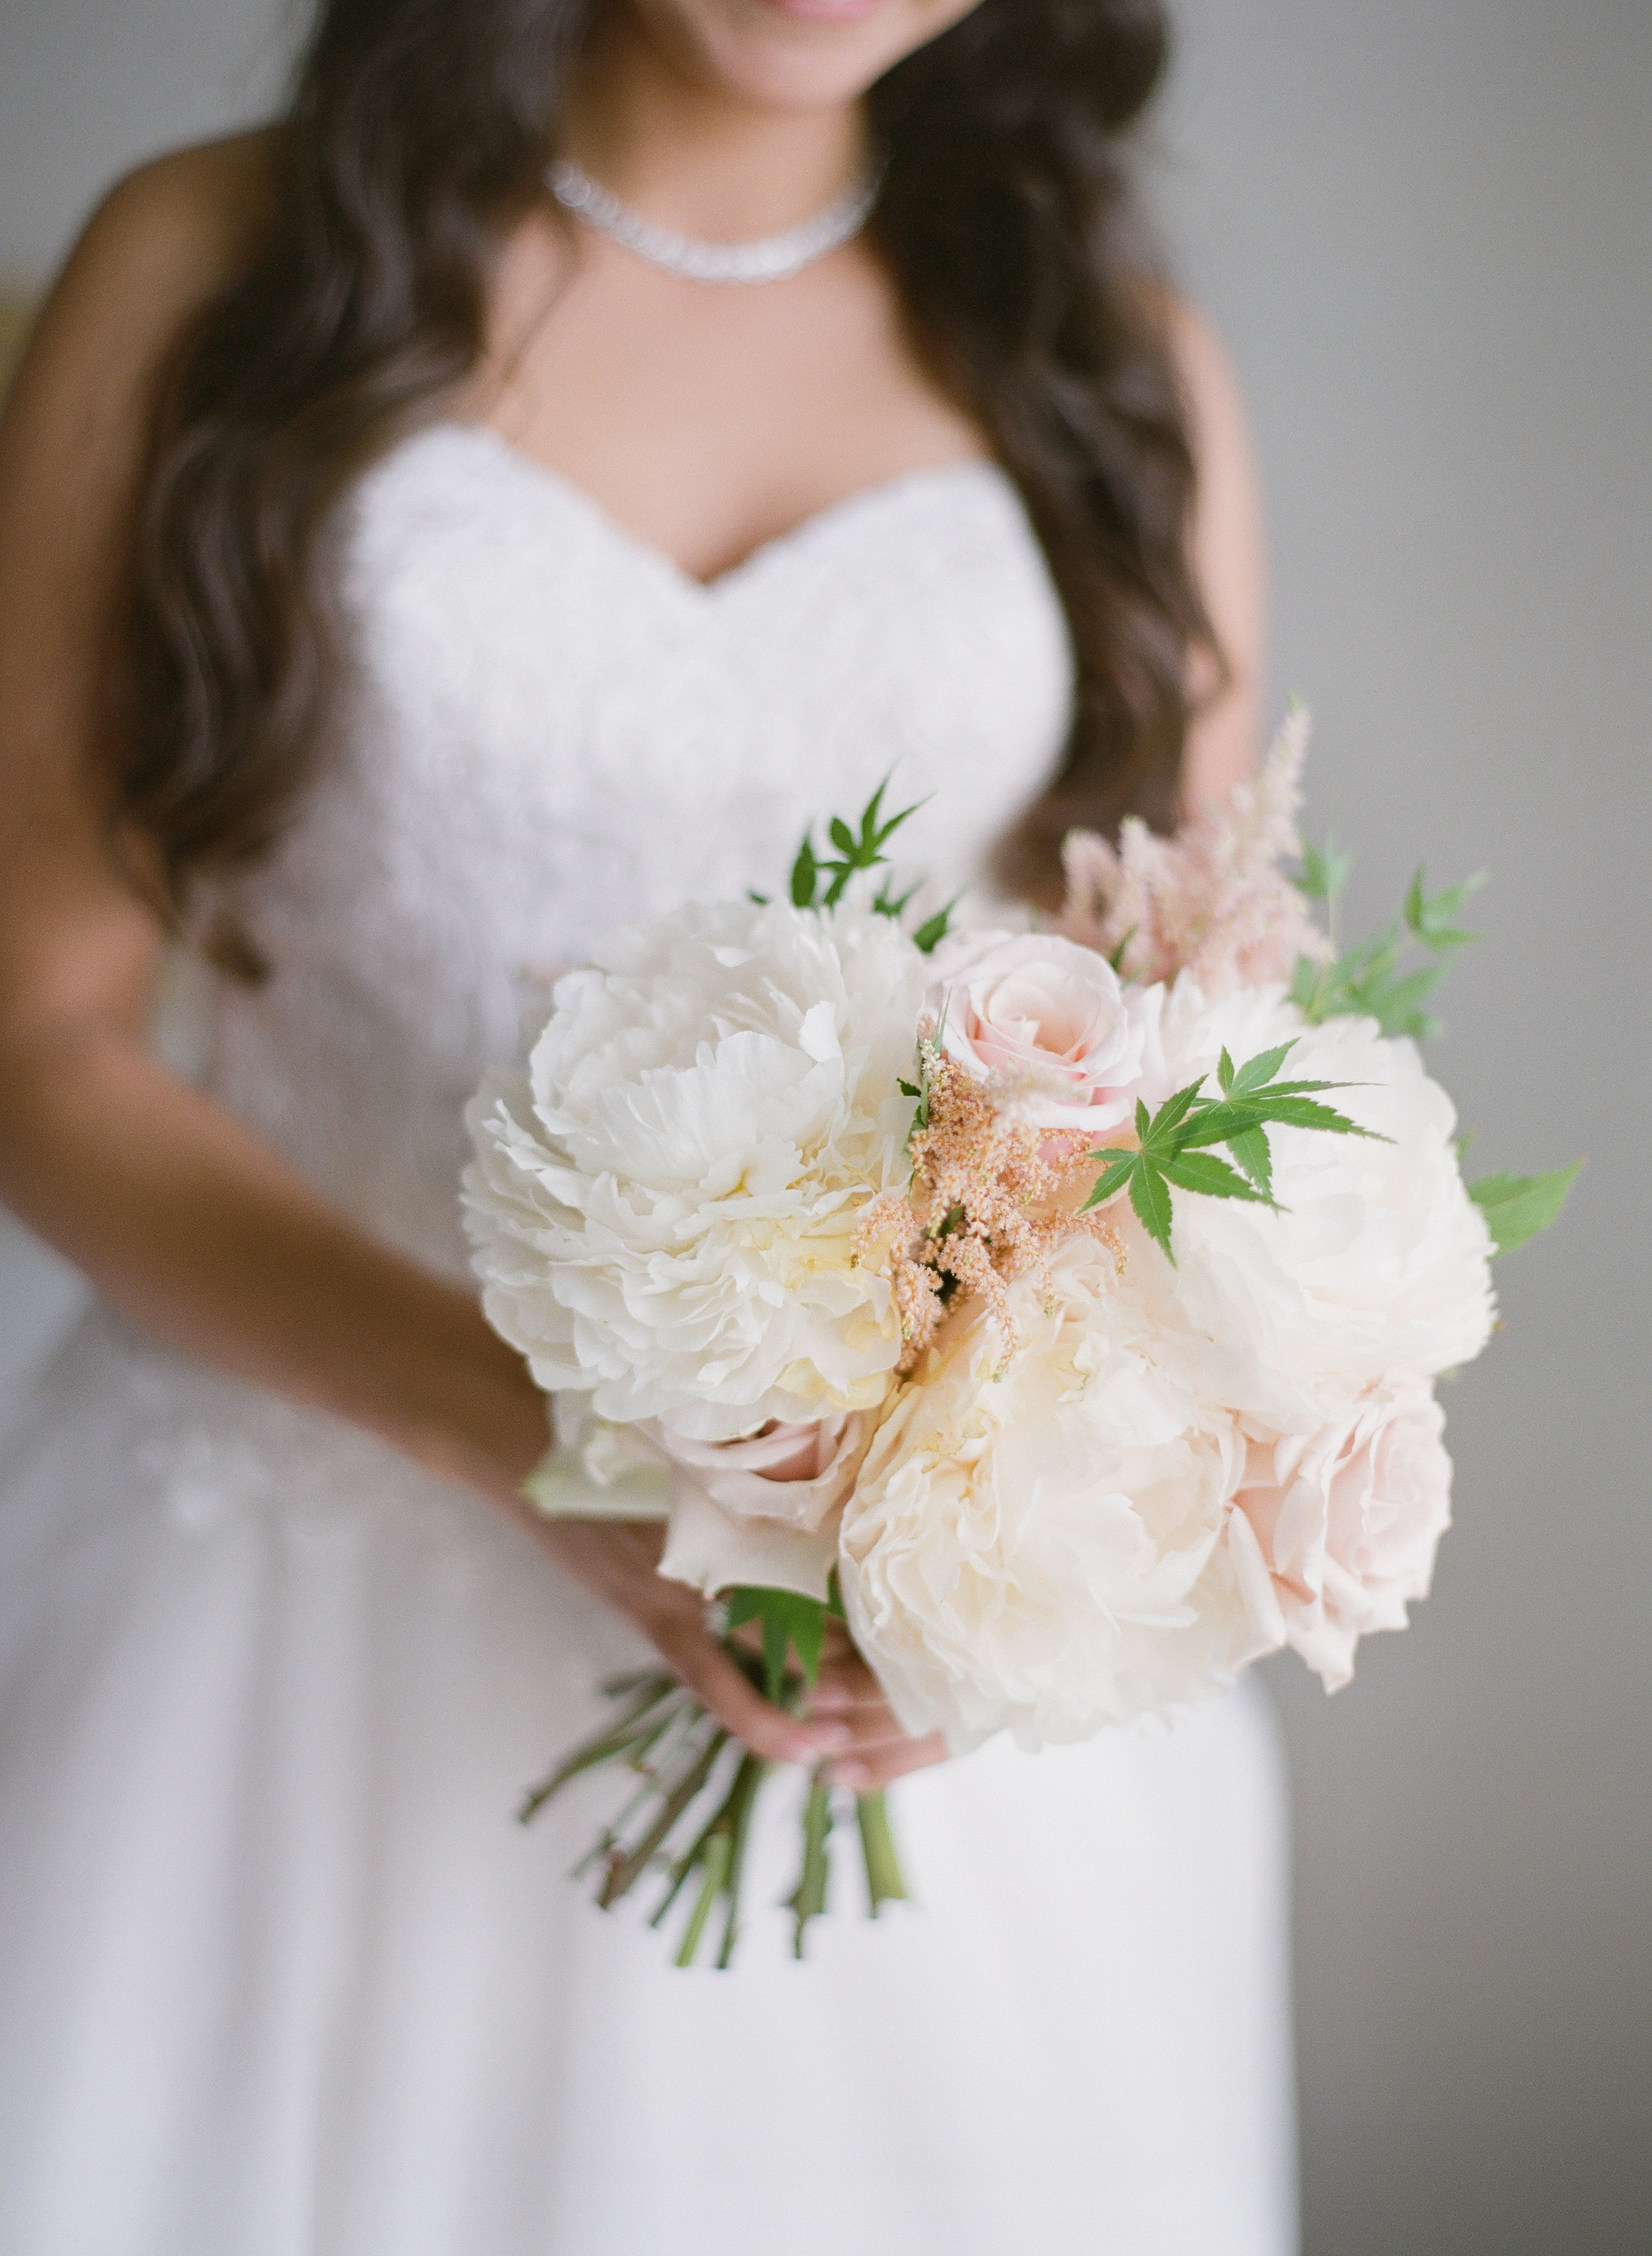 YK_wedding17_0152.jpg